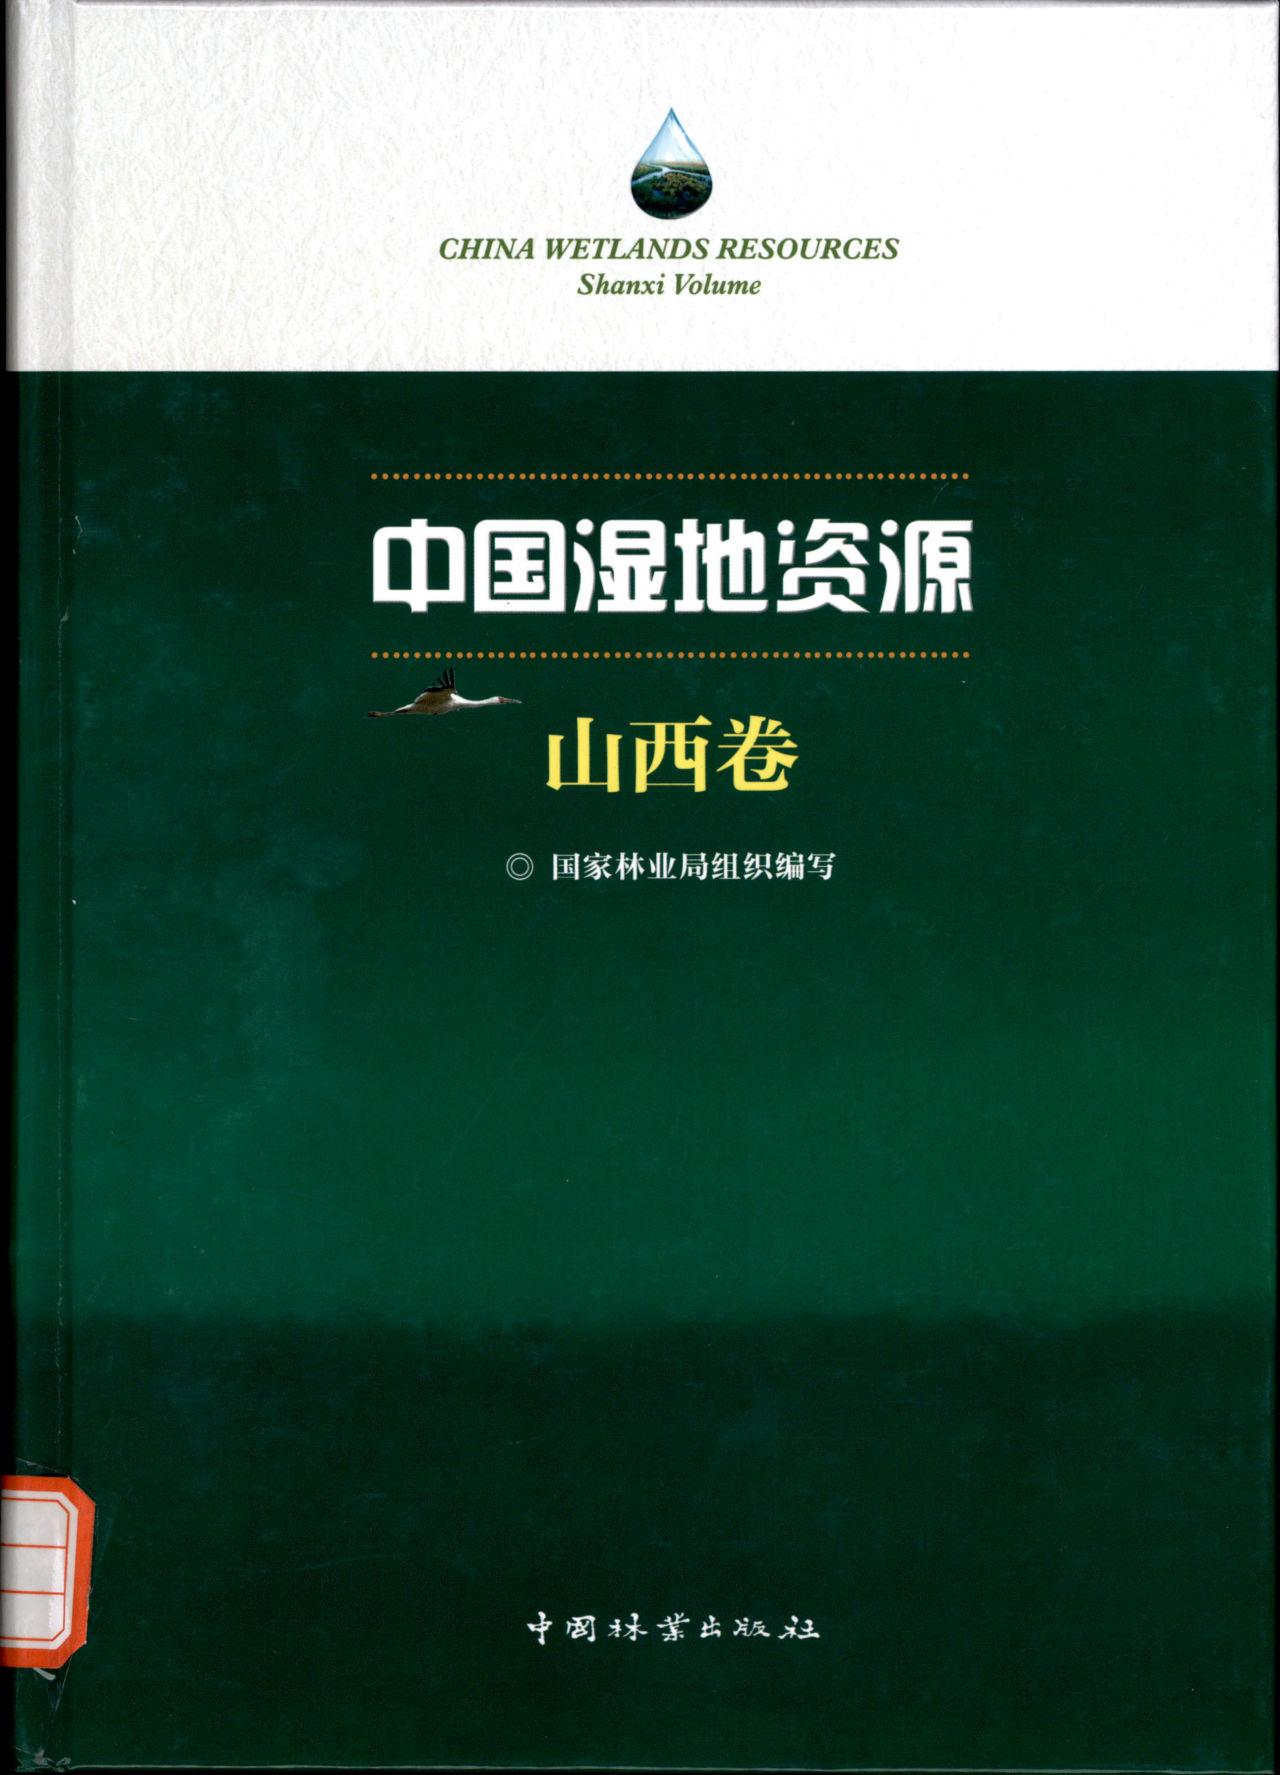 CHINA WETLANDS RESOURCES Shanxi Volume 中国湿地资源 山西卷